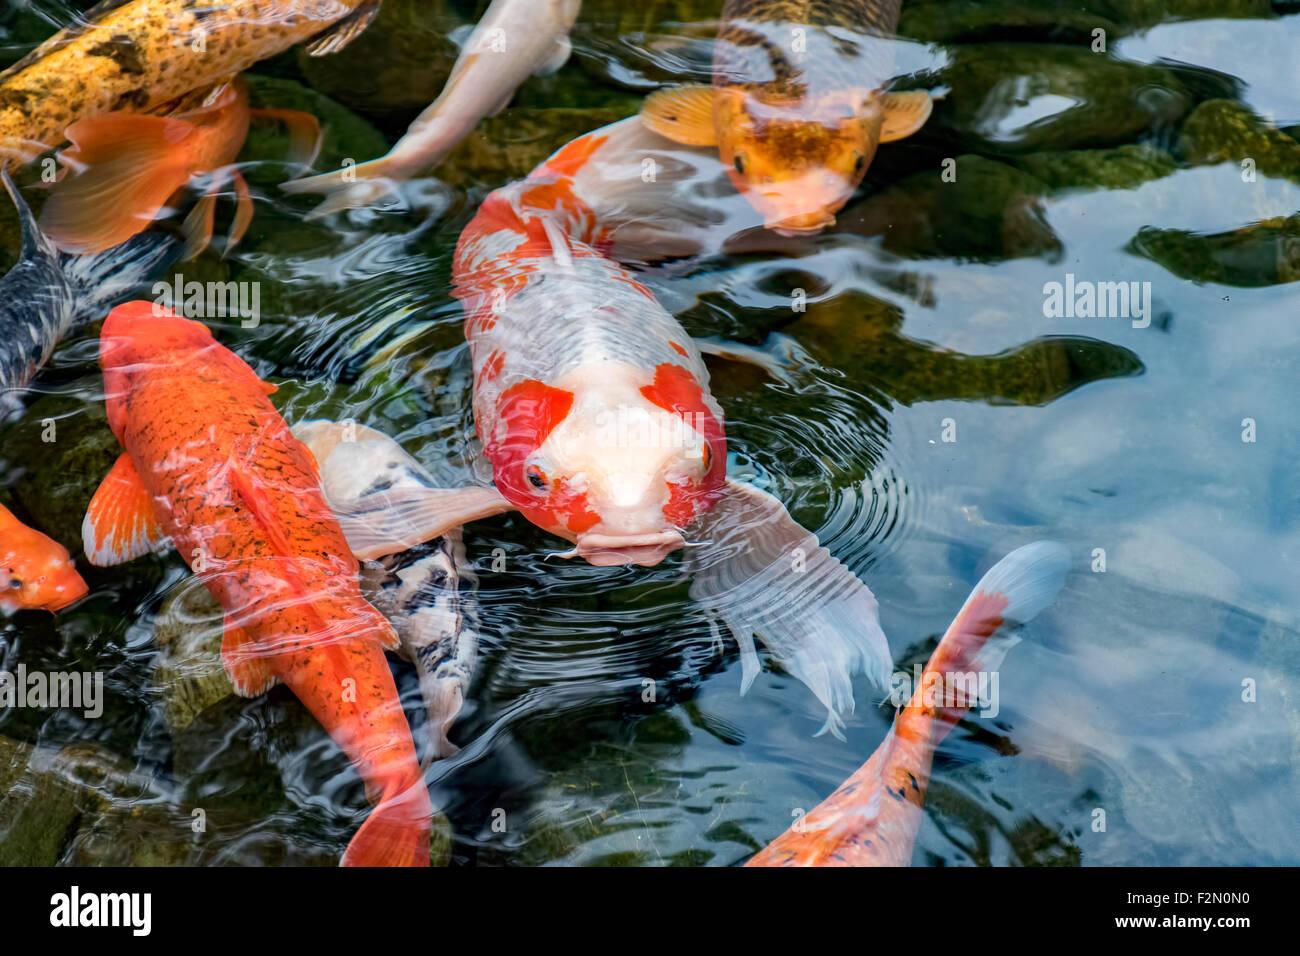 Carp fish stock photos carp fish stock images alamy for Koi carp pond